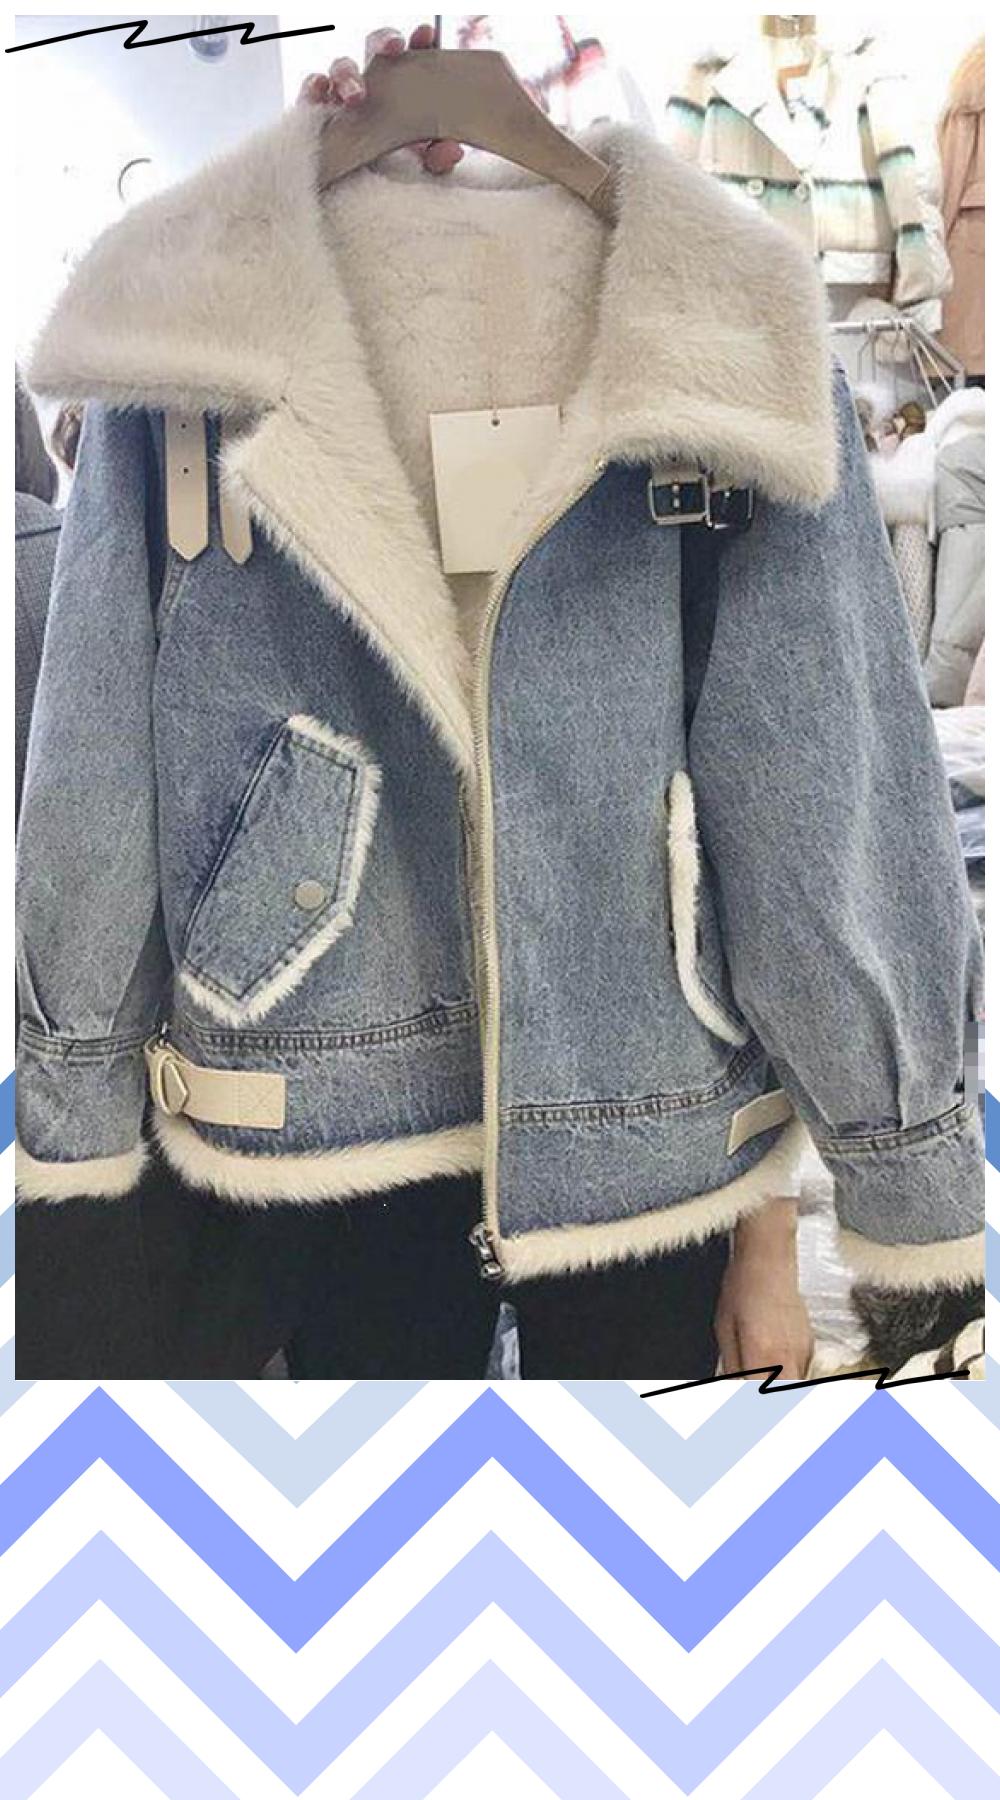 Womens Lamb Wool Jeans Coat Jackets Faux Fur Collar Padded Warm Outerwear Coats Basic Women Cowboy Denim Jacket Warm Outerwear Jeans Coat Jackets Jackets [ 1800 x 1000 Pixel ]